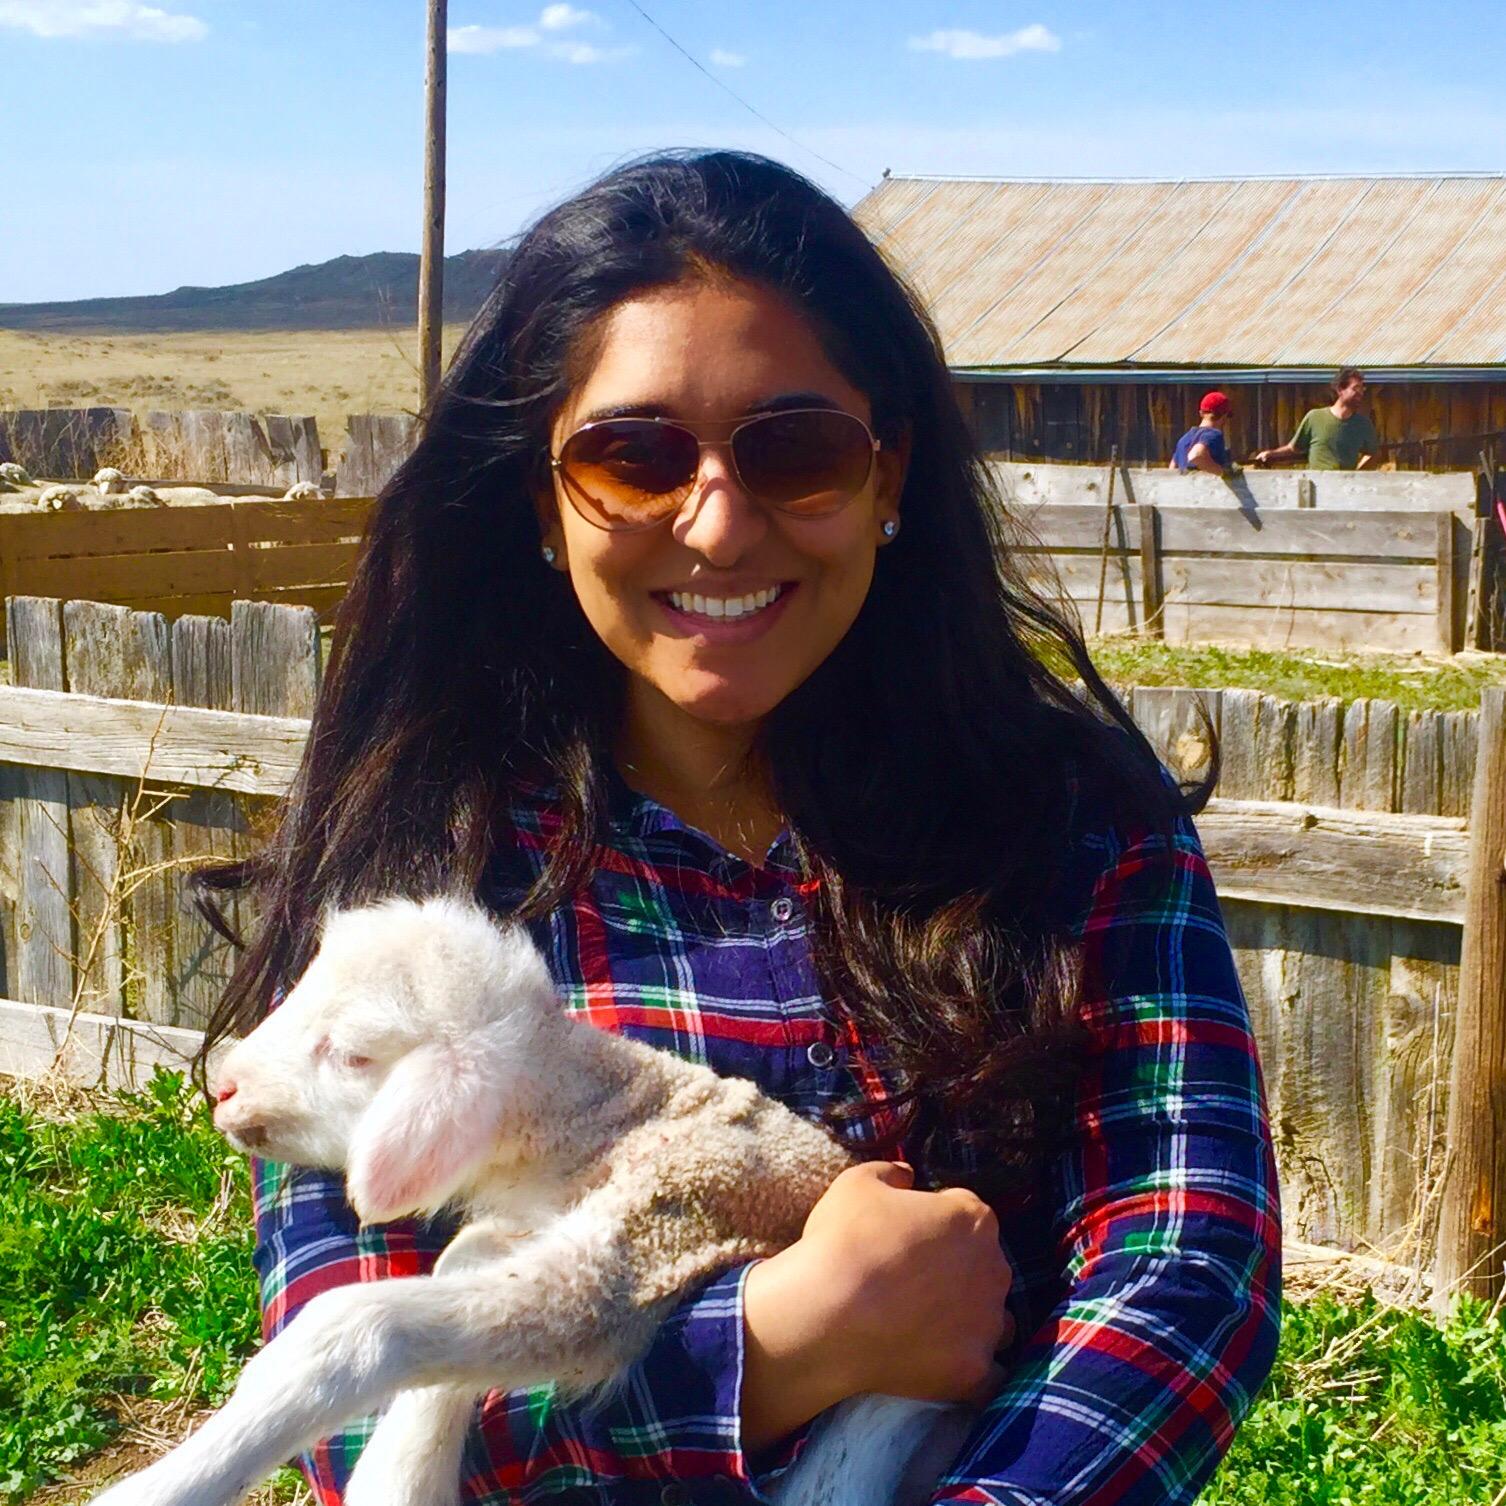 Naveen holding a newborn lamb